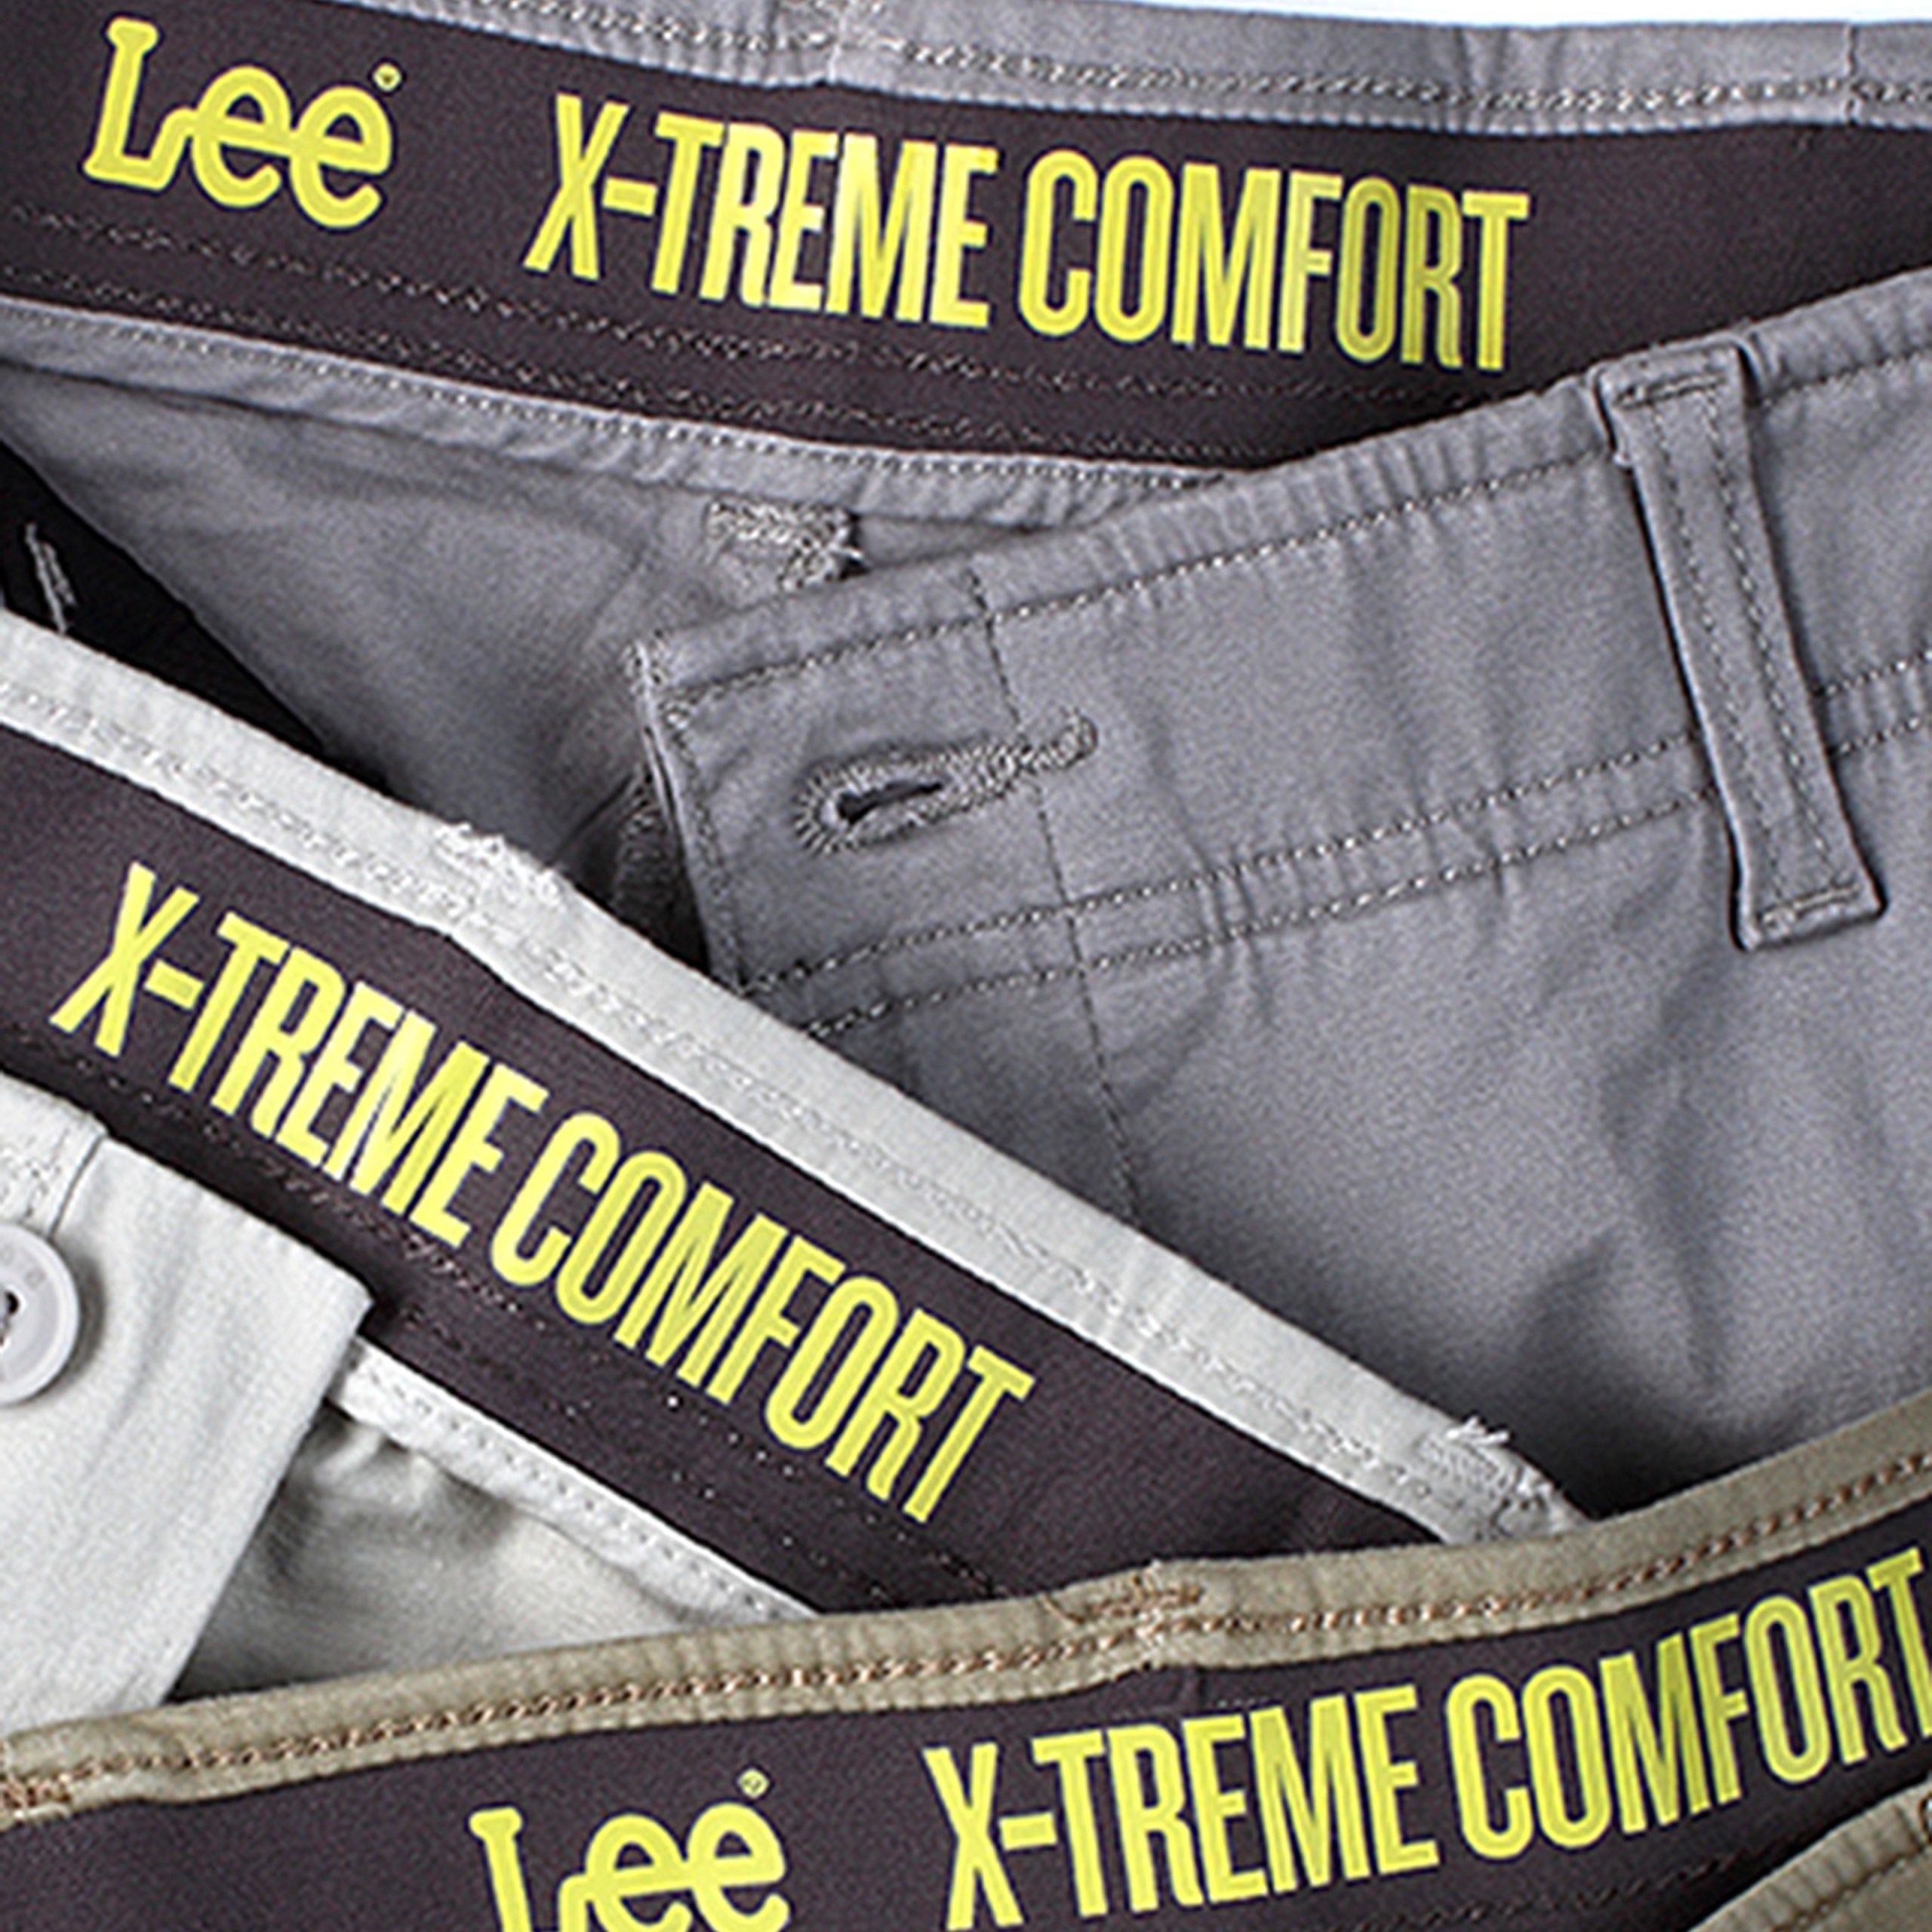 LEE Men's Performance Series Extreme Comfort Khaki Pant, Iron, 32W x 34L by LEE (Image #1)